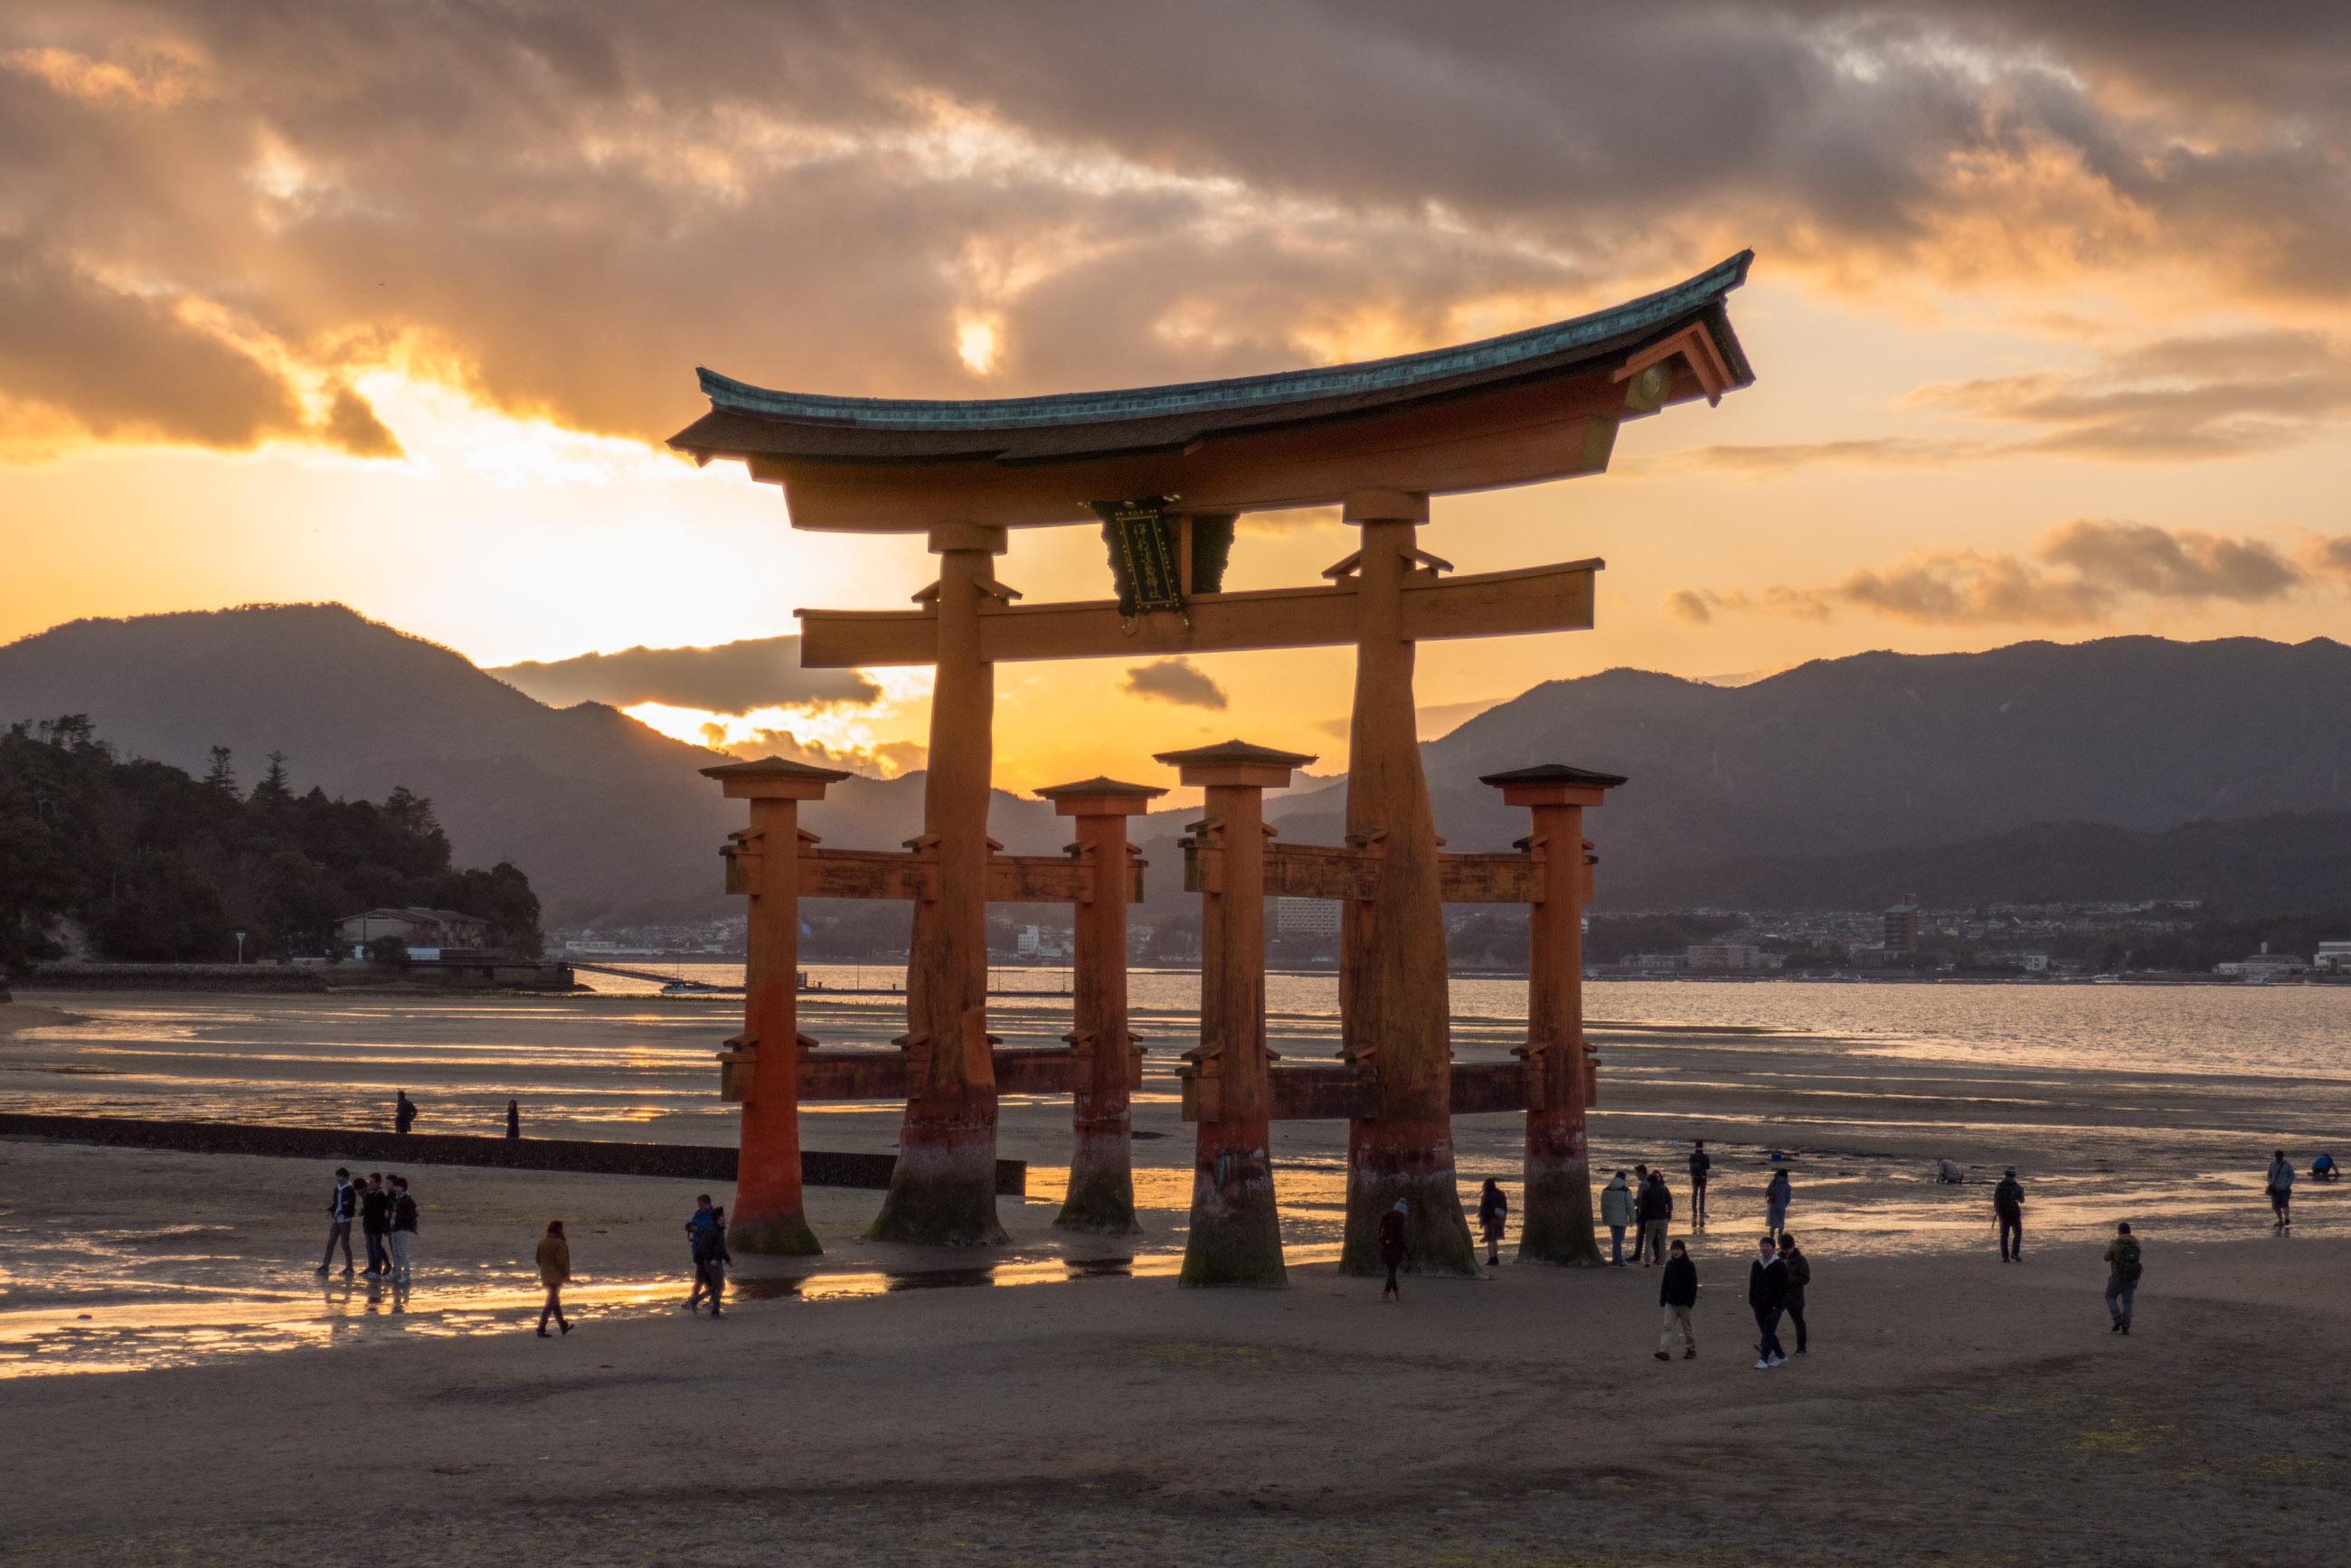 https://bubo.sk/uploads/galleries/3469/martin_simko_tori-brana-na-ostrove-miyajima.jpg